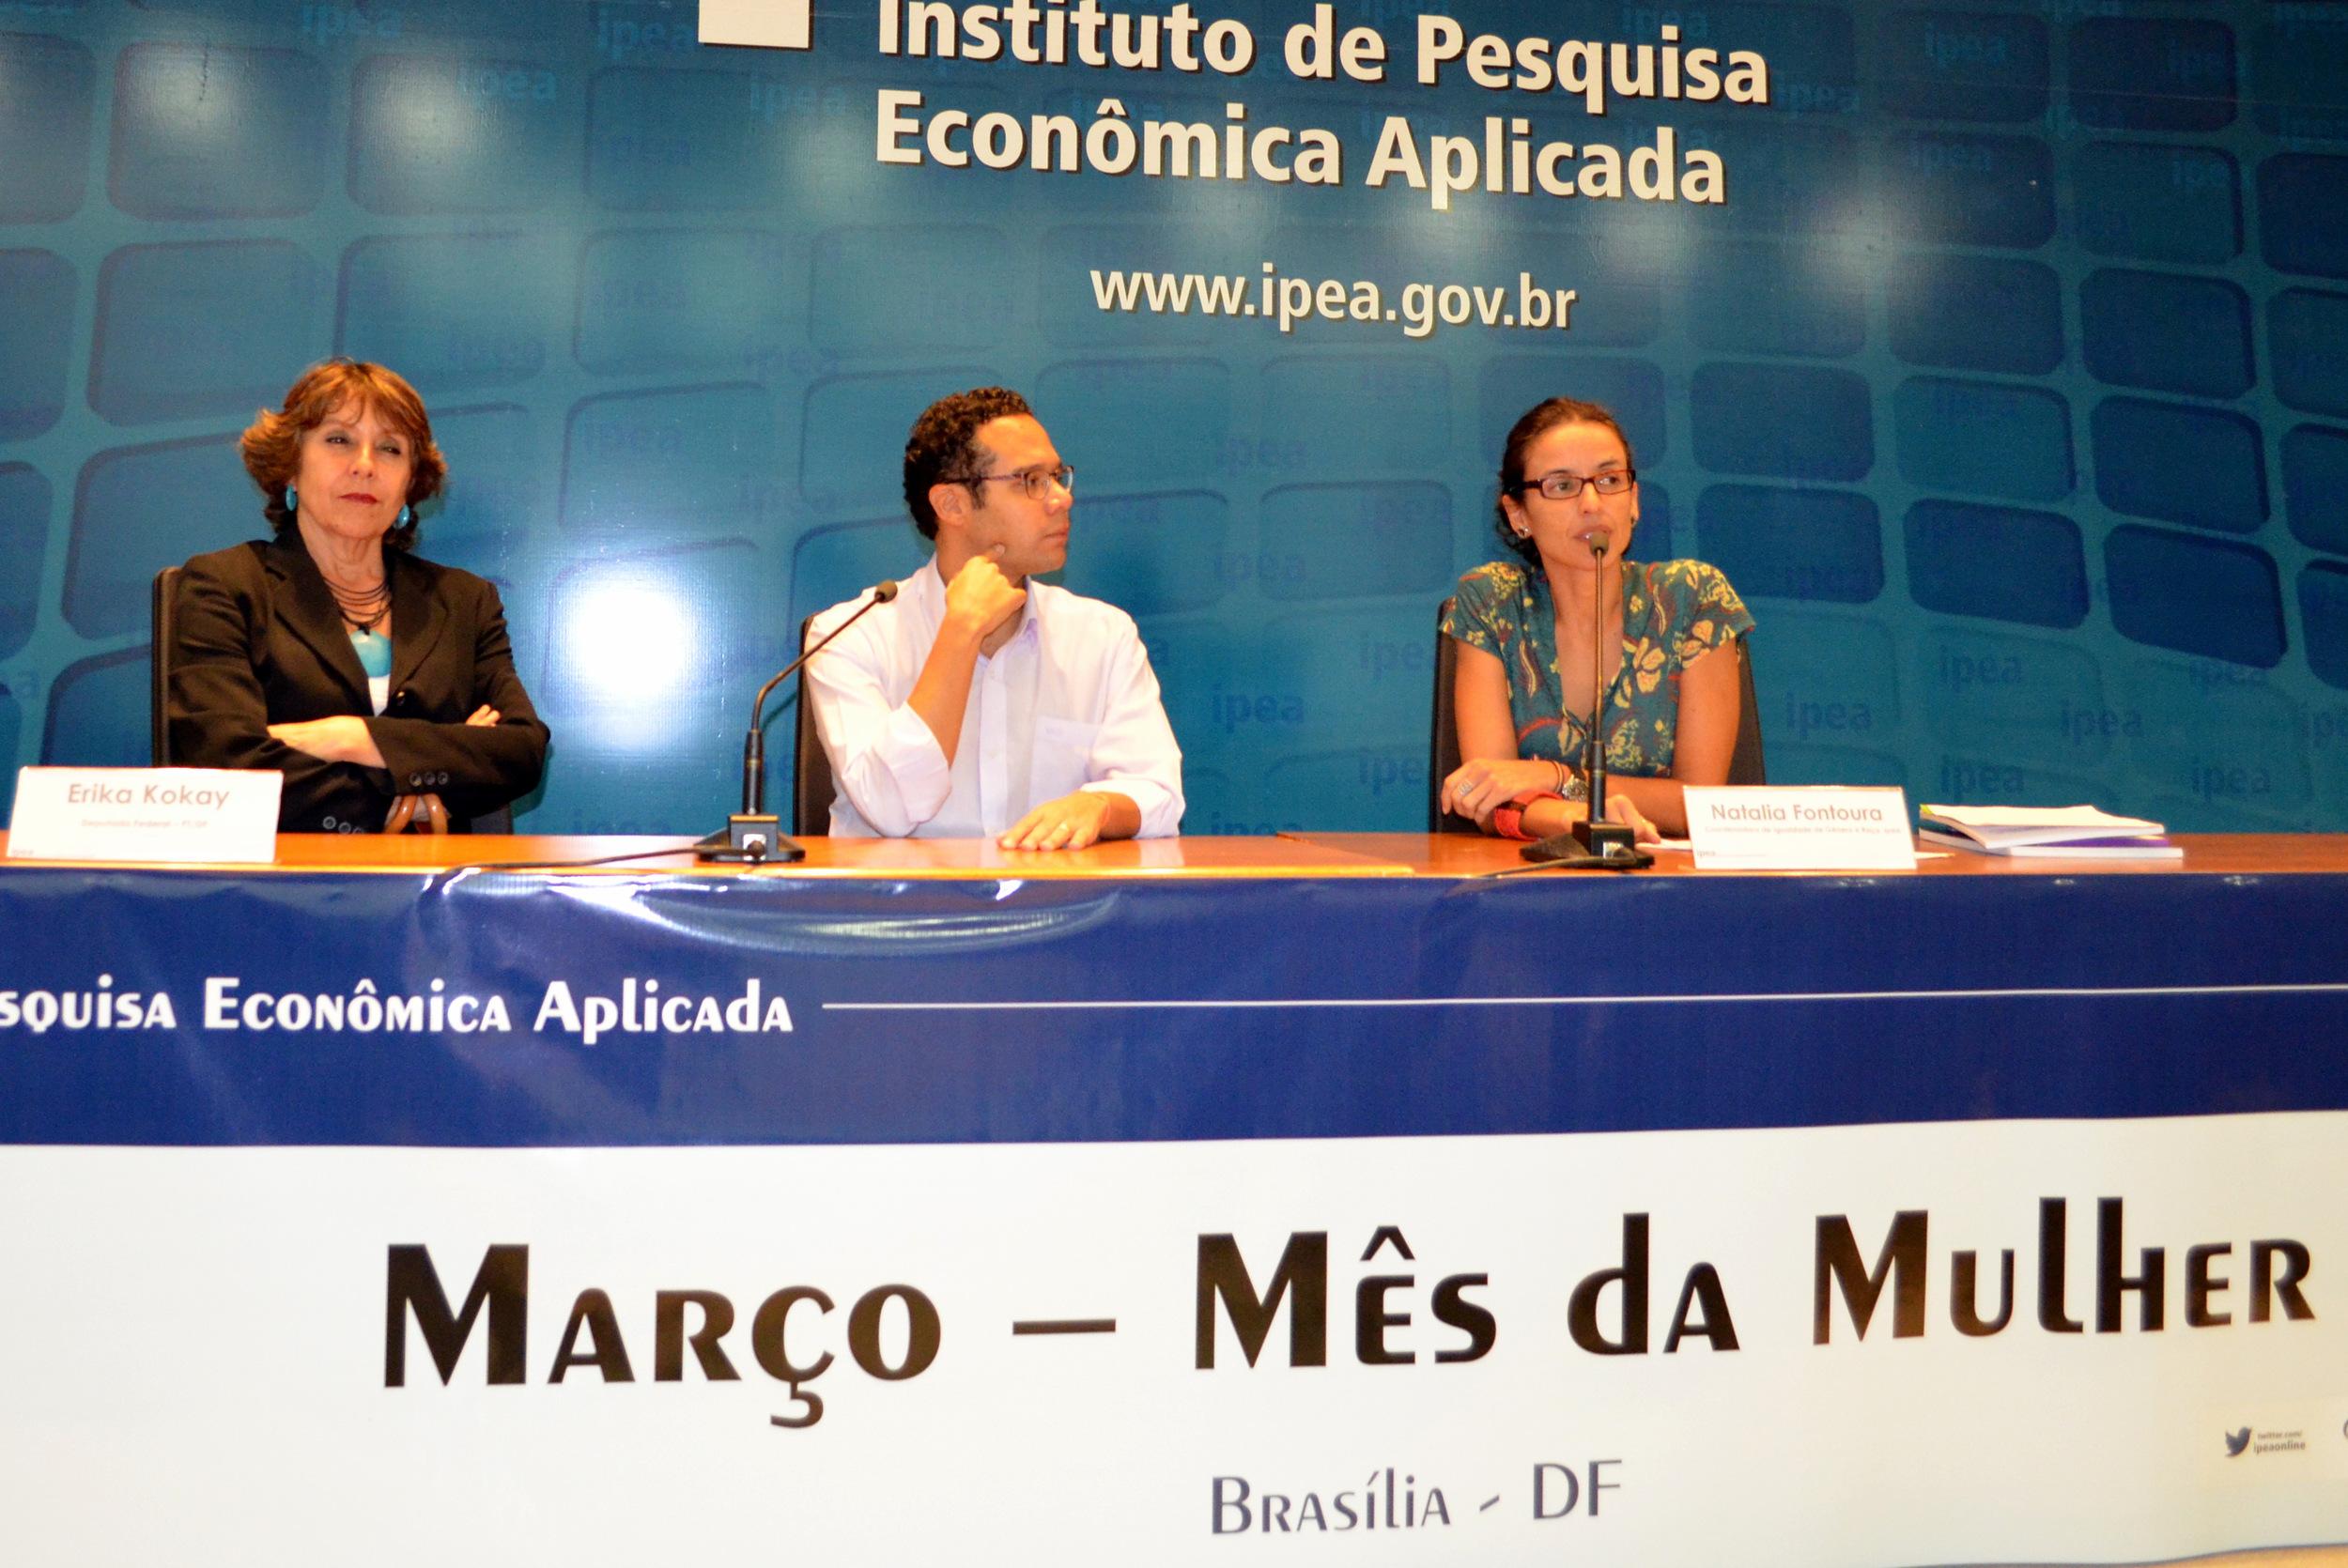 Deputada Federal Érika Kokay, presidente da AFIPEA, Fábio de Sá, e EPPGG Natália Fontoura. Foto: Filipe Calmon / ANESP